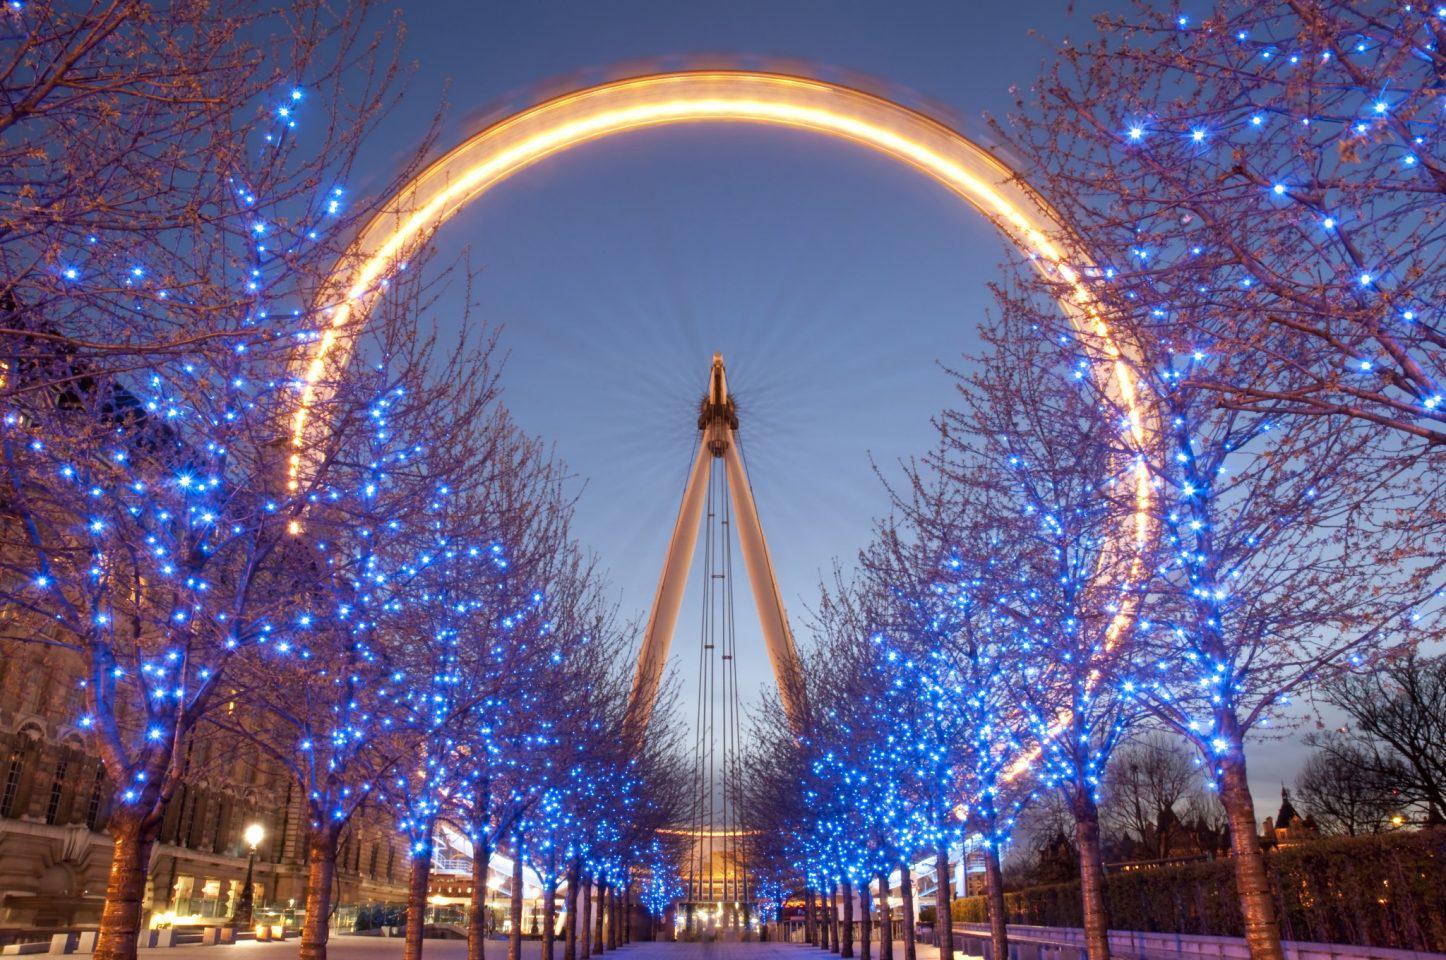 London_20pl_shutterstock_60021220 Ταξίδι στο Λονδίνο: Τα καλύτερα αξιοθέατα στην πρωτεύουσα της Αγγλίας